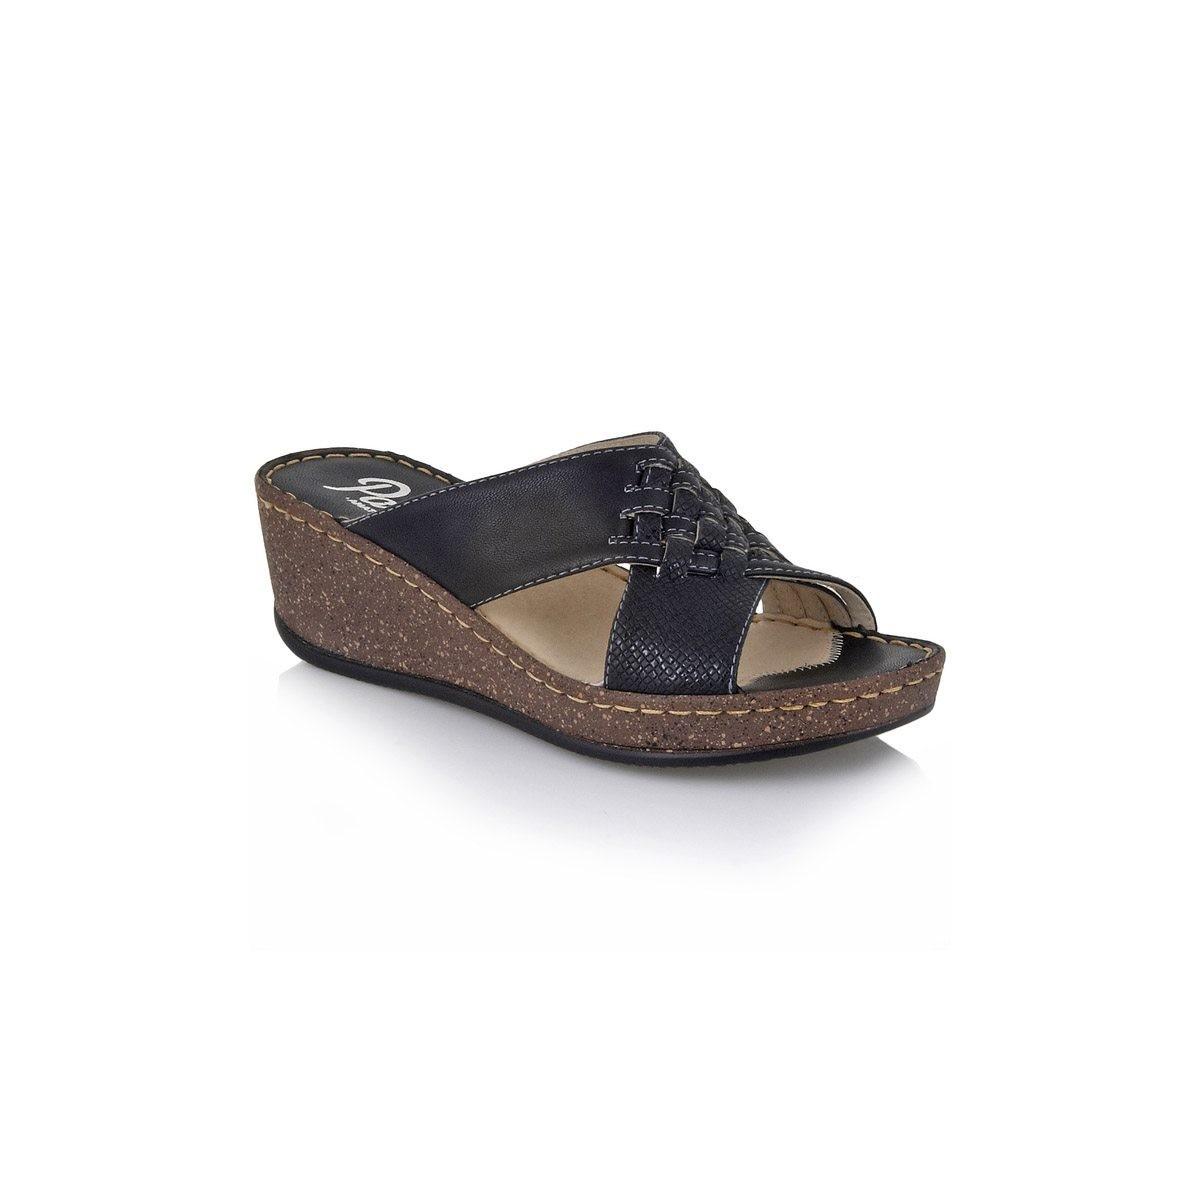 39d1f530727 Γυναικεία Ανατομικά Παπούτσια - Ακριβότερα Προϊόντα - Σελίδα 8   Outfit.gr